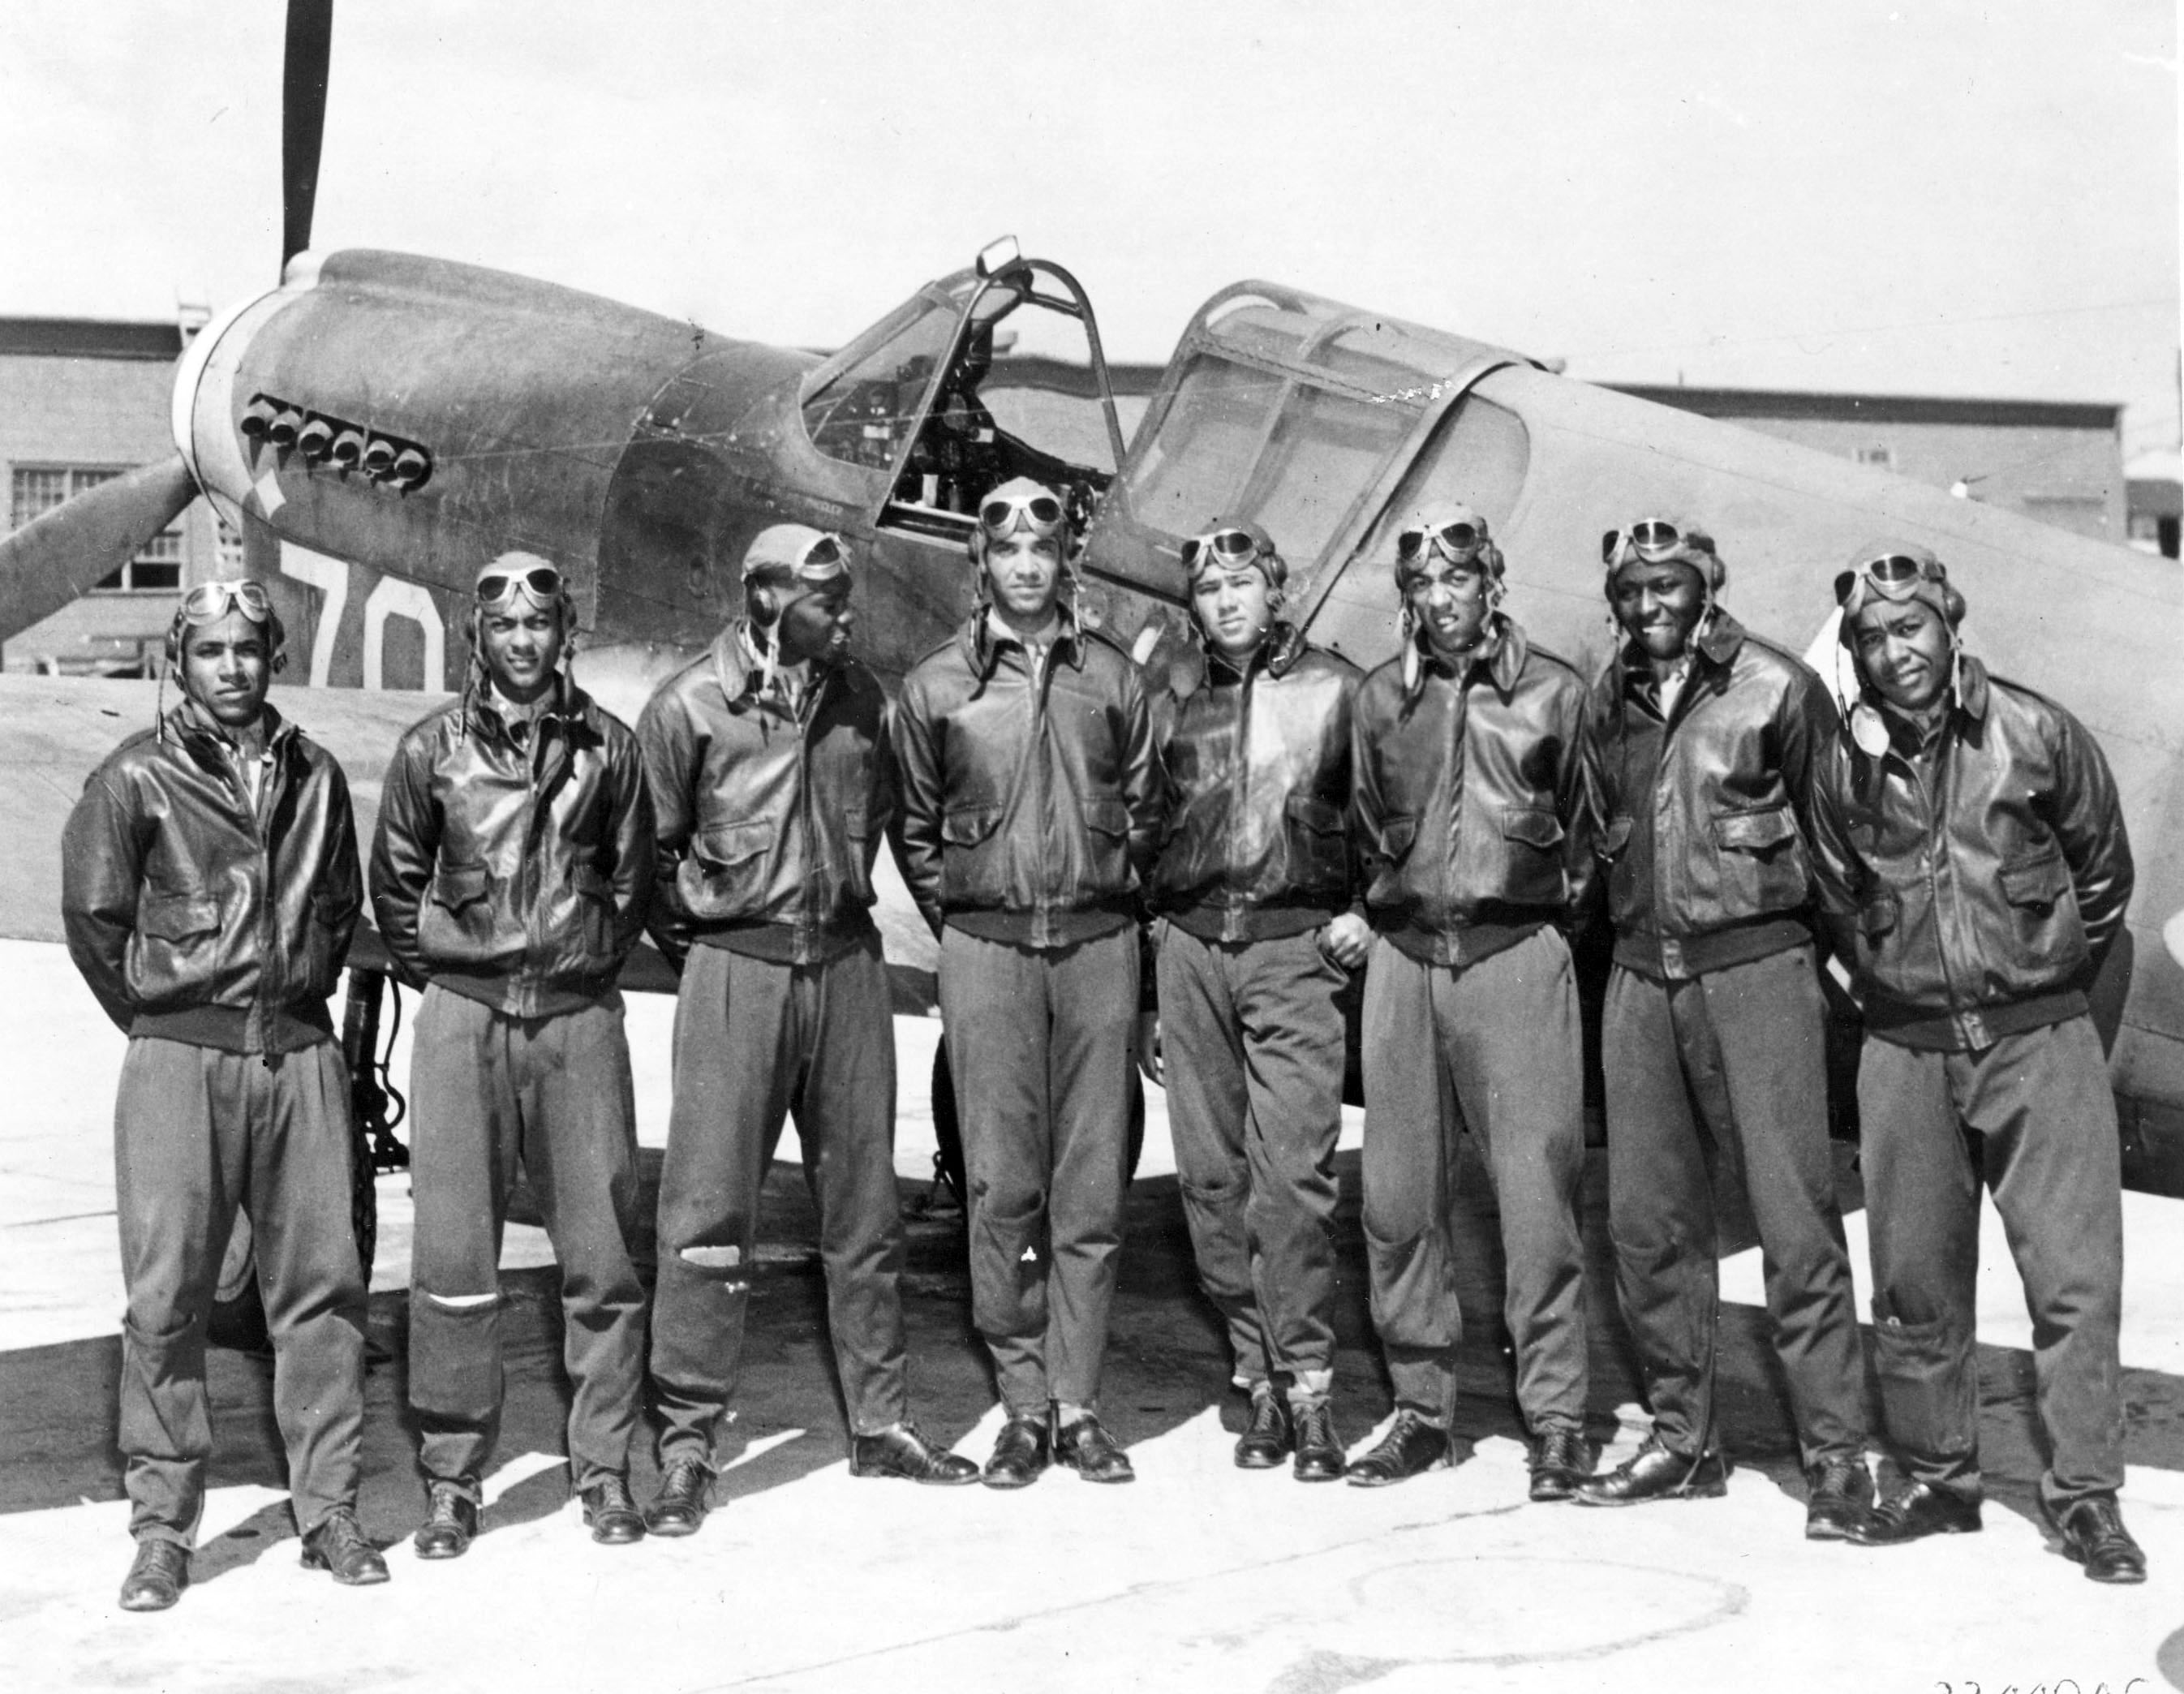 Tuskegee Airmen, ca. 1943